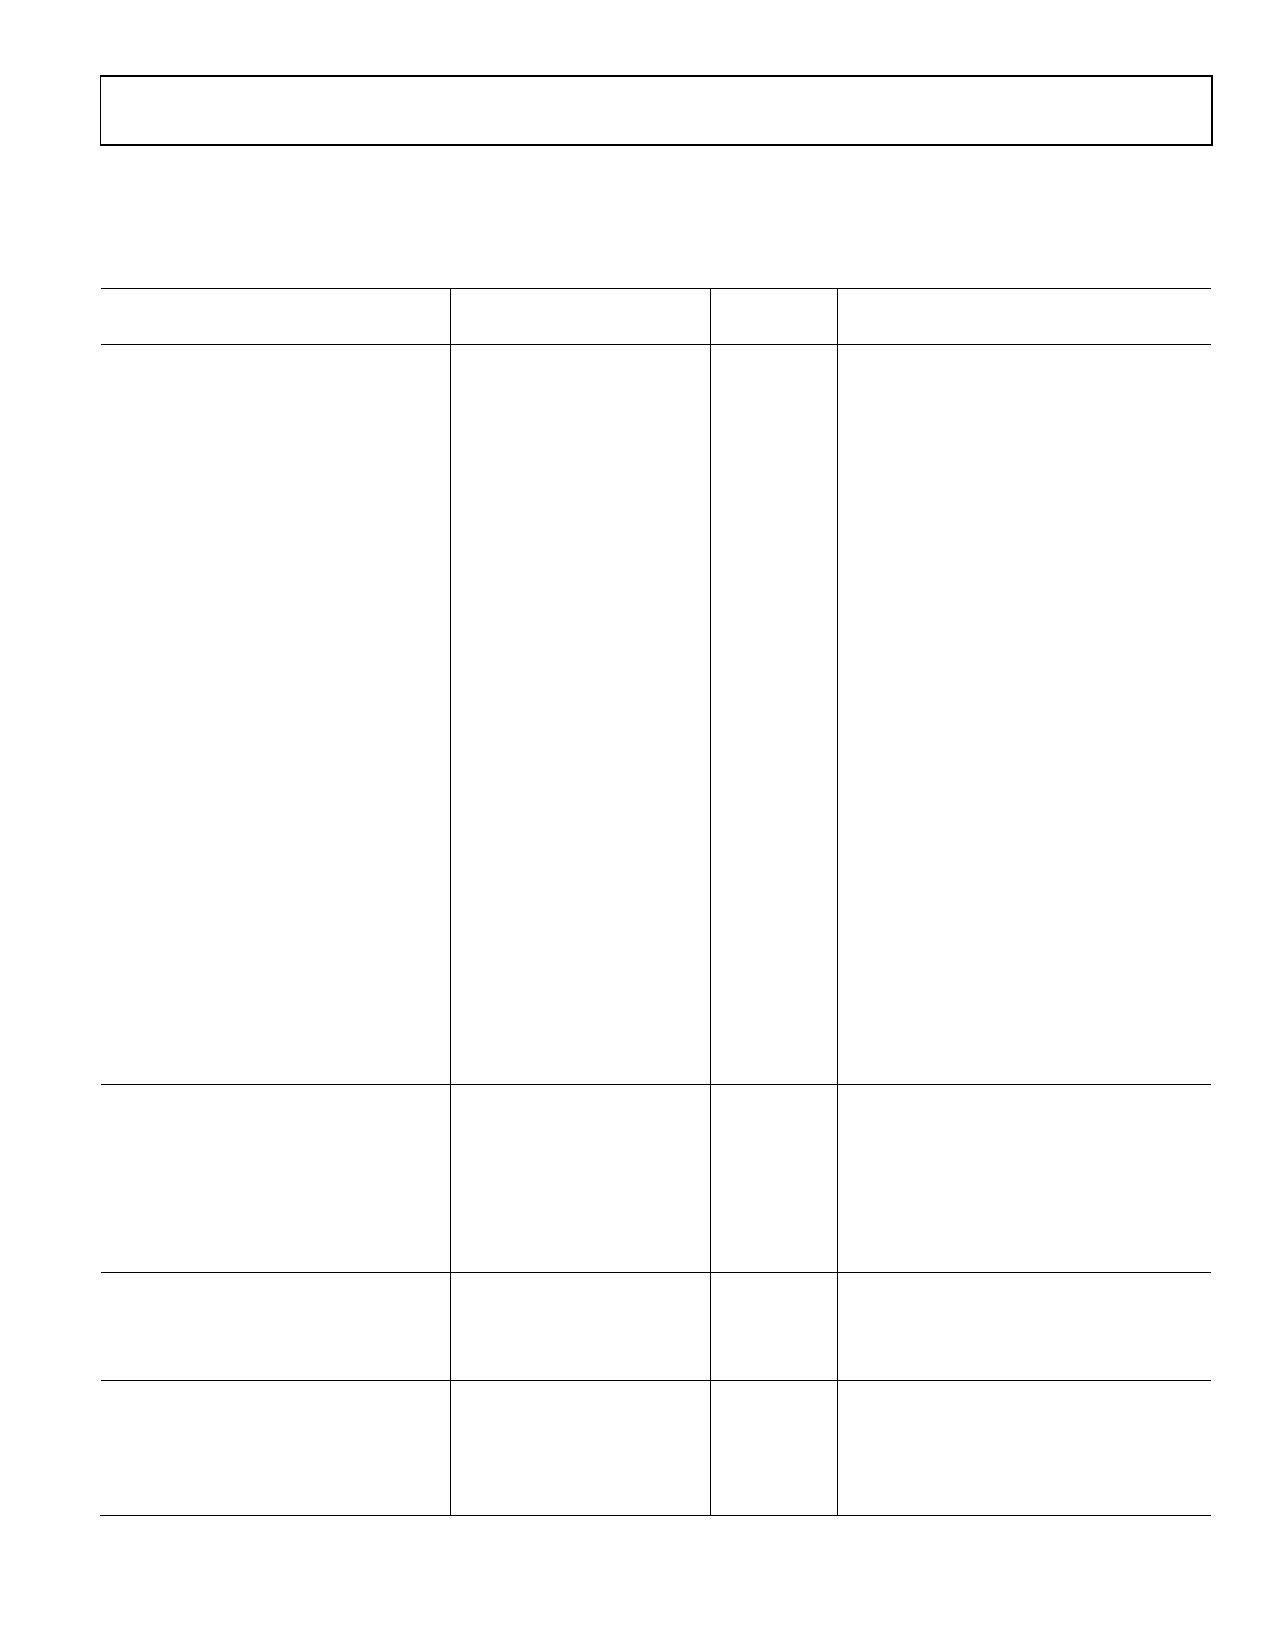 AD5663R pdf, arduino